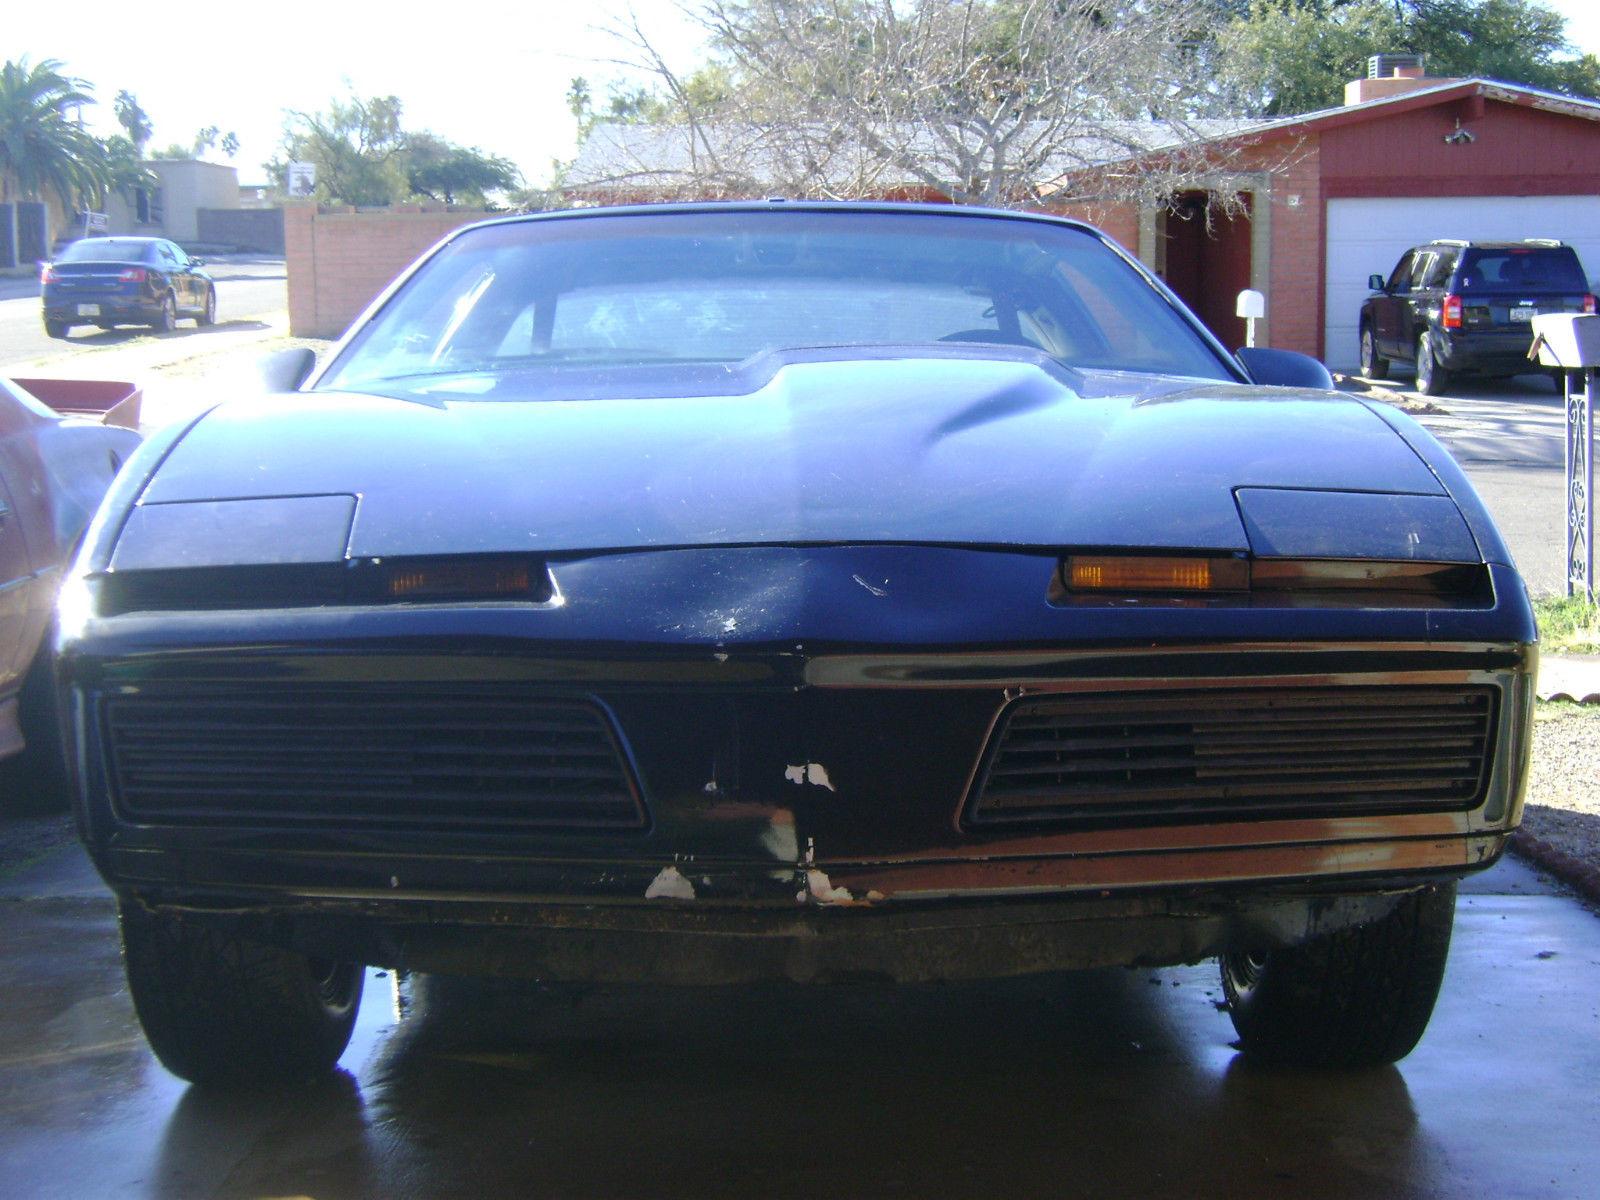 1982 pontiac firebird trans am knight rider car classic pontiac trans am 1982 for sale. Black Bedroom Furniture Sets. Home Design Ideas